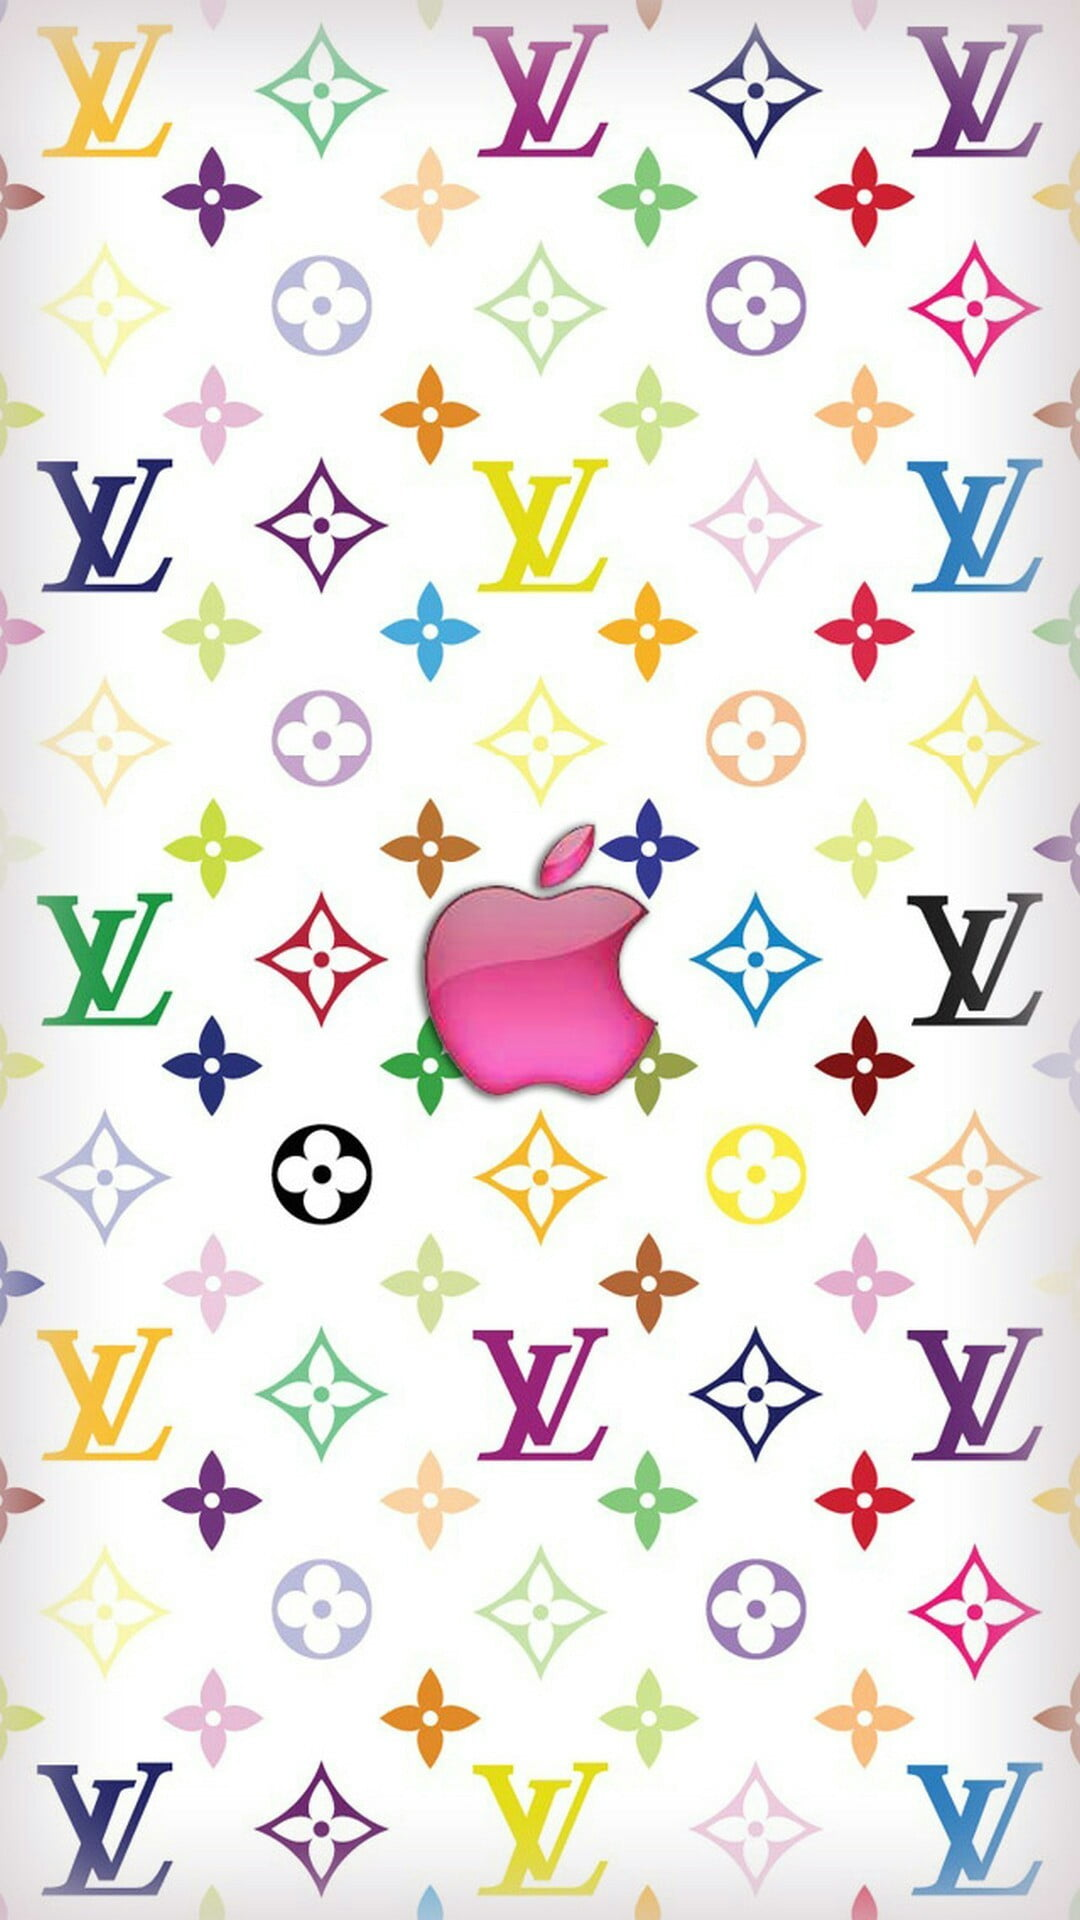 Louis Vuitton Apple Iphone Wallpaper